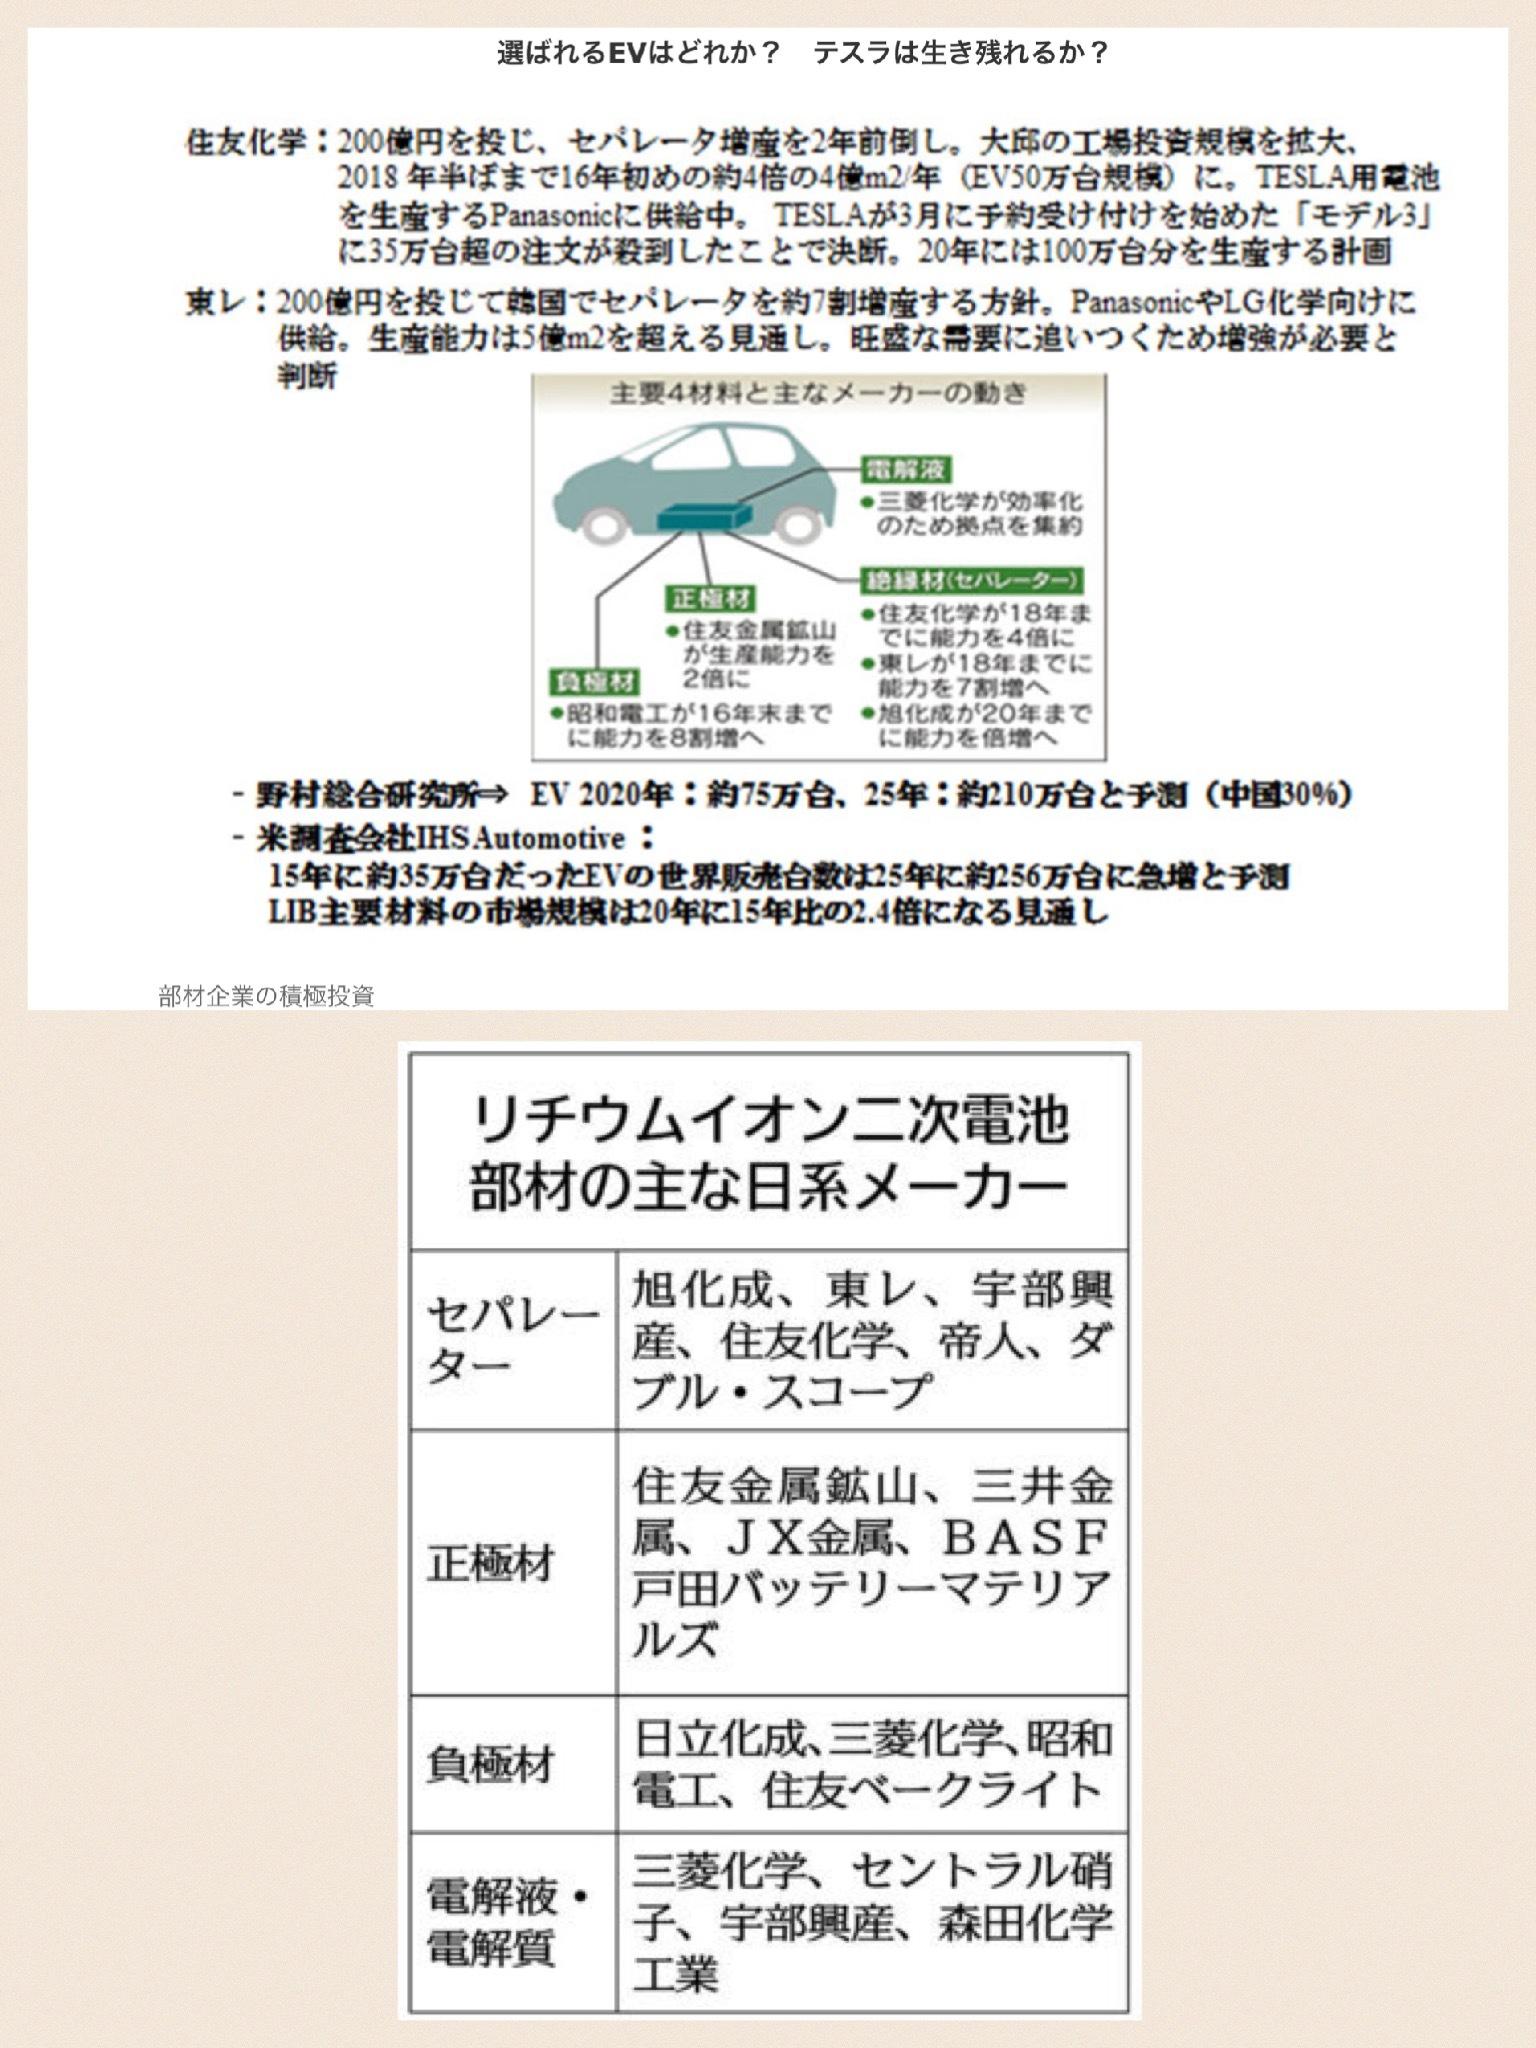 EV素材メーカー 日経ビジネス